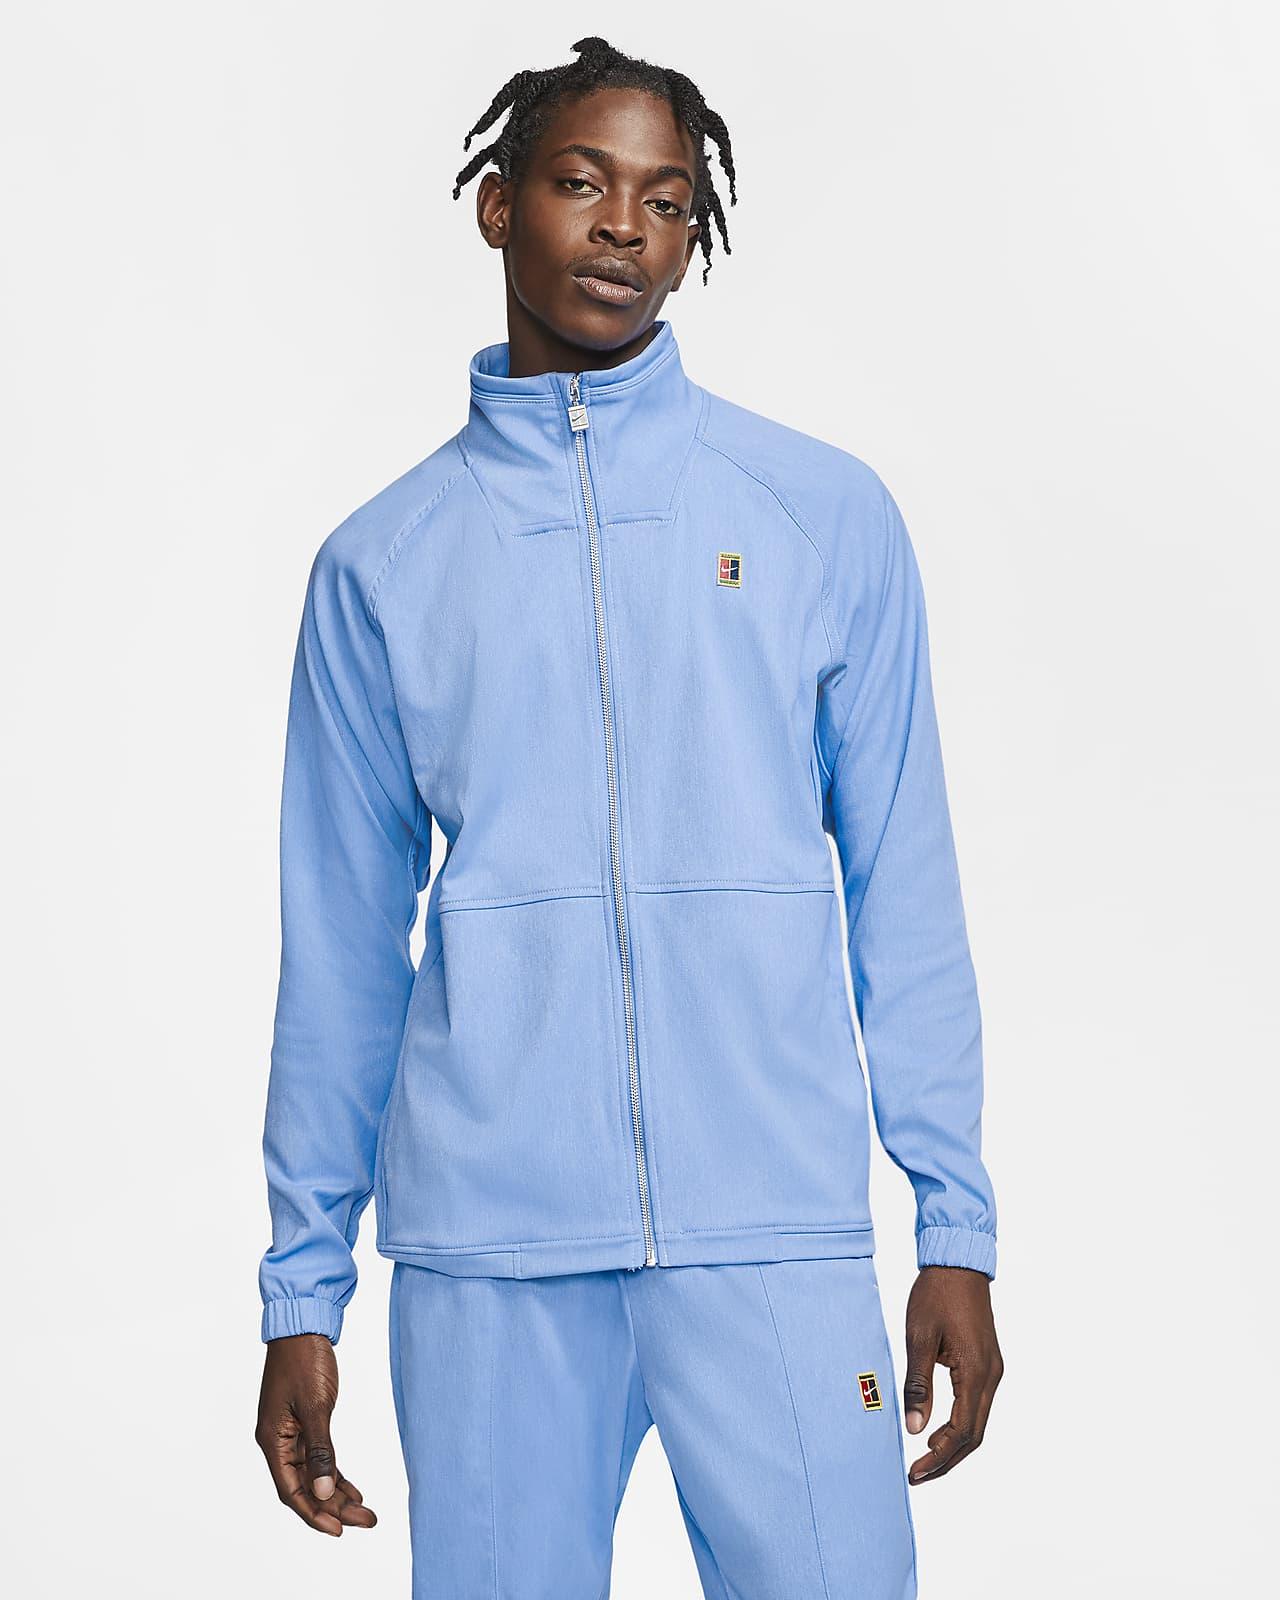 NikeCourt Men's Tennis Warm-Up Jacket